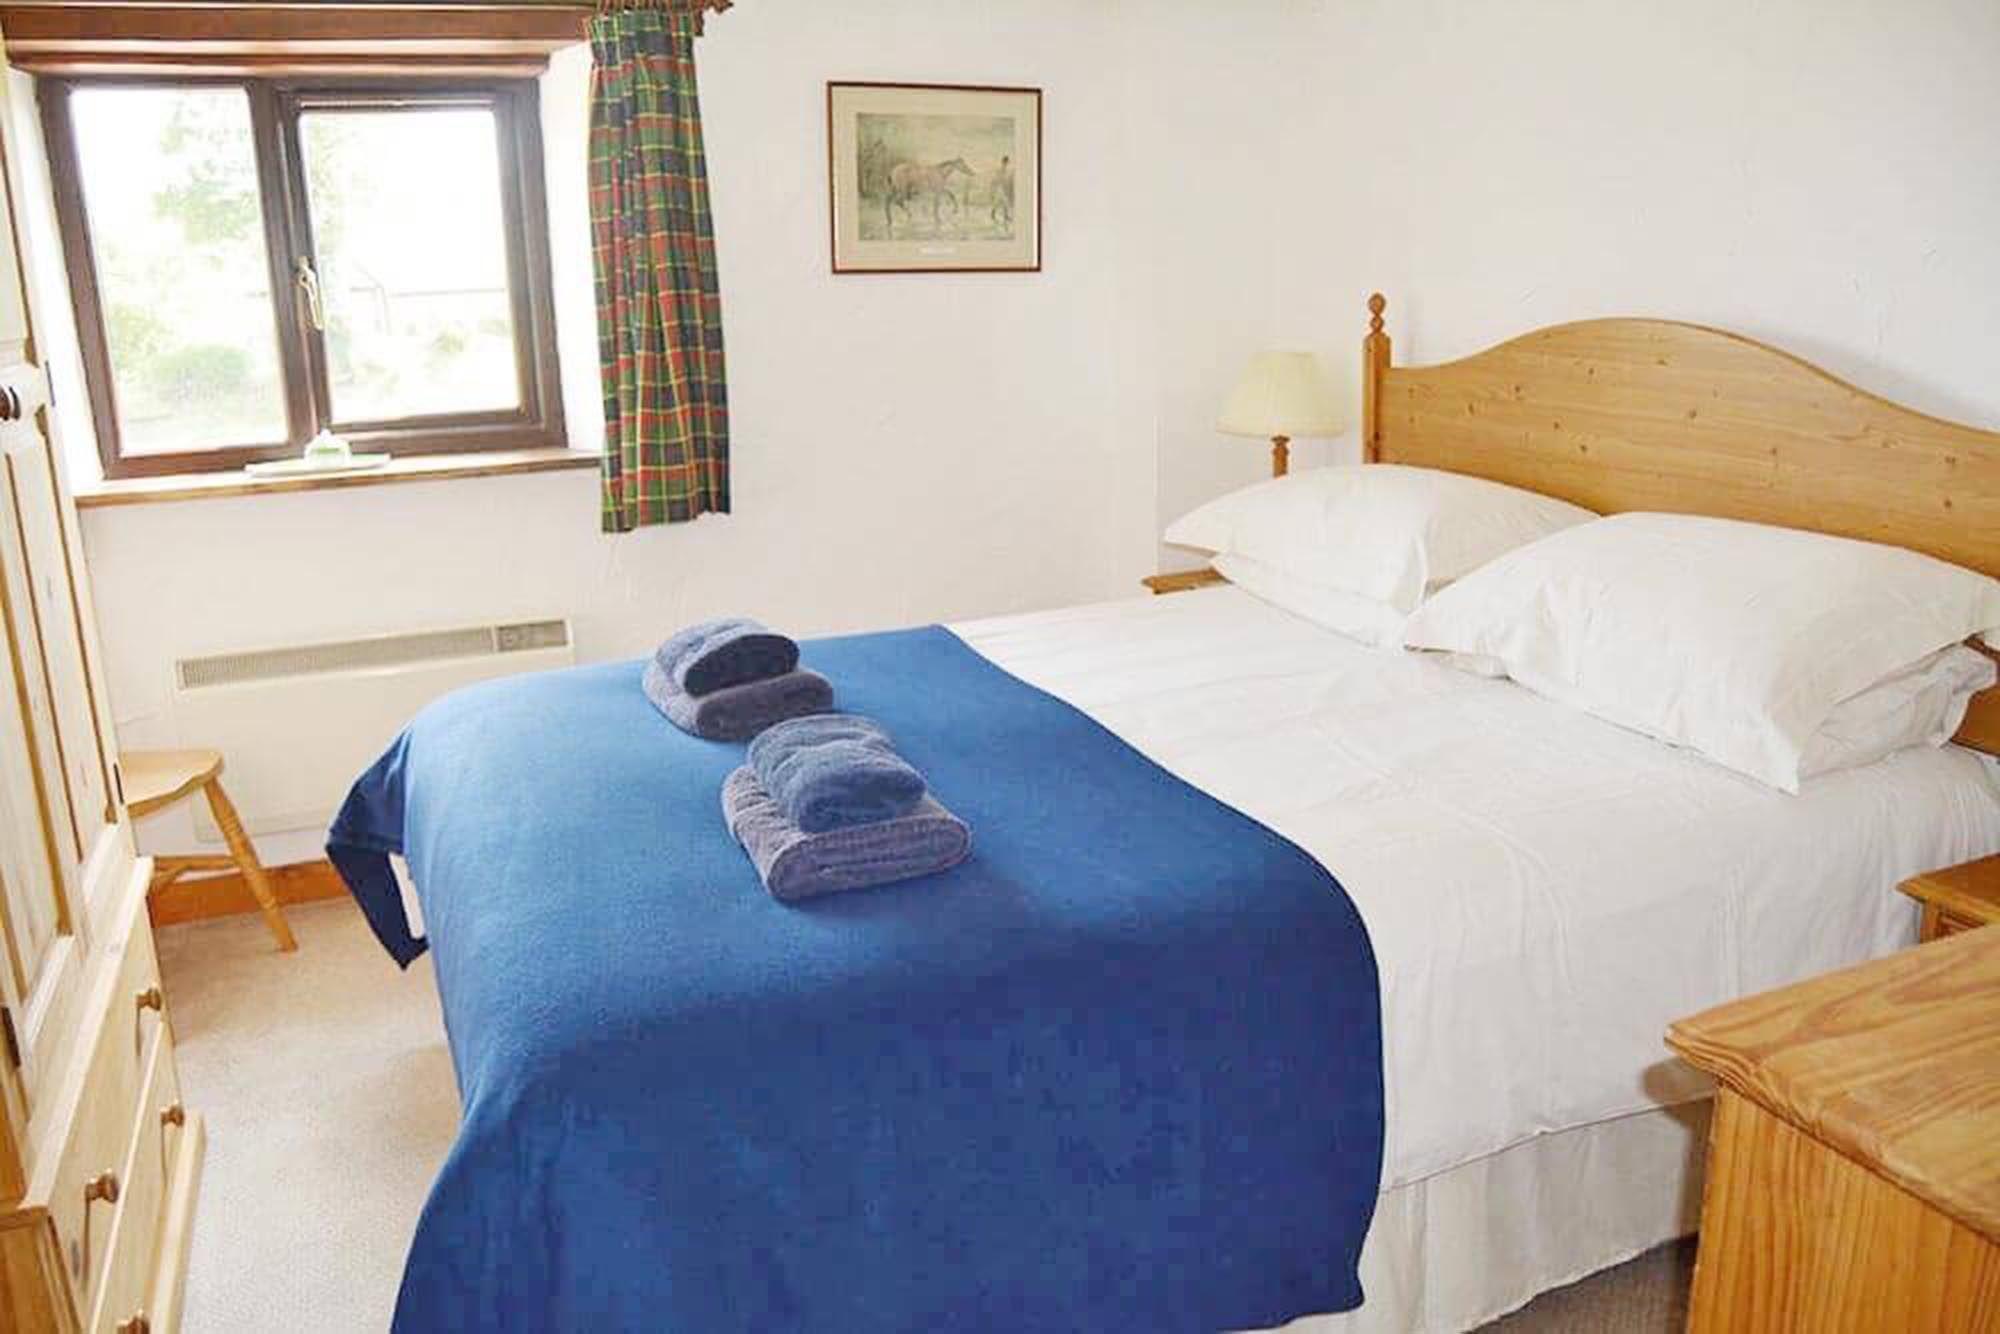 Norton Cottage ground floor: Double bedroom with 5' king size bed and en suite bathroom